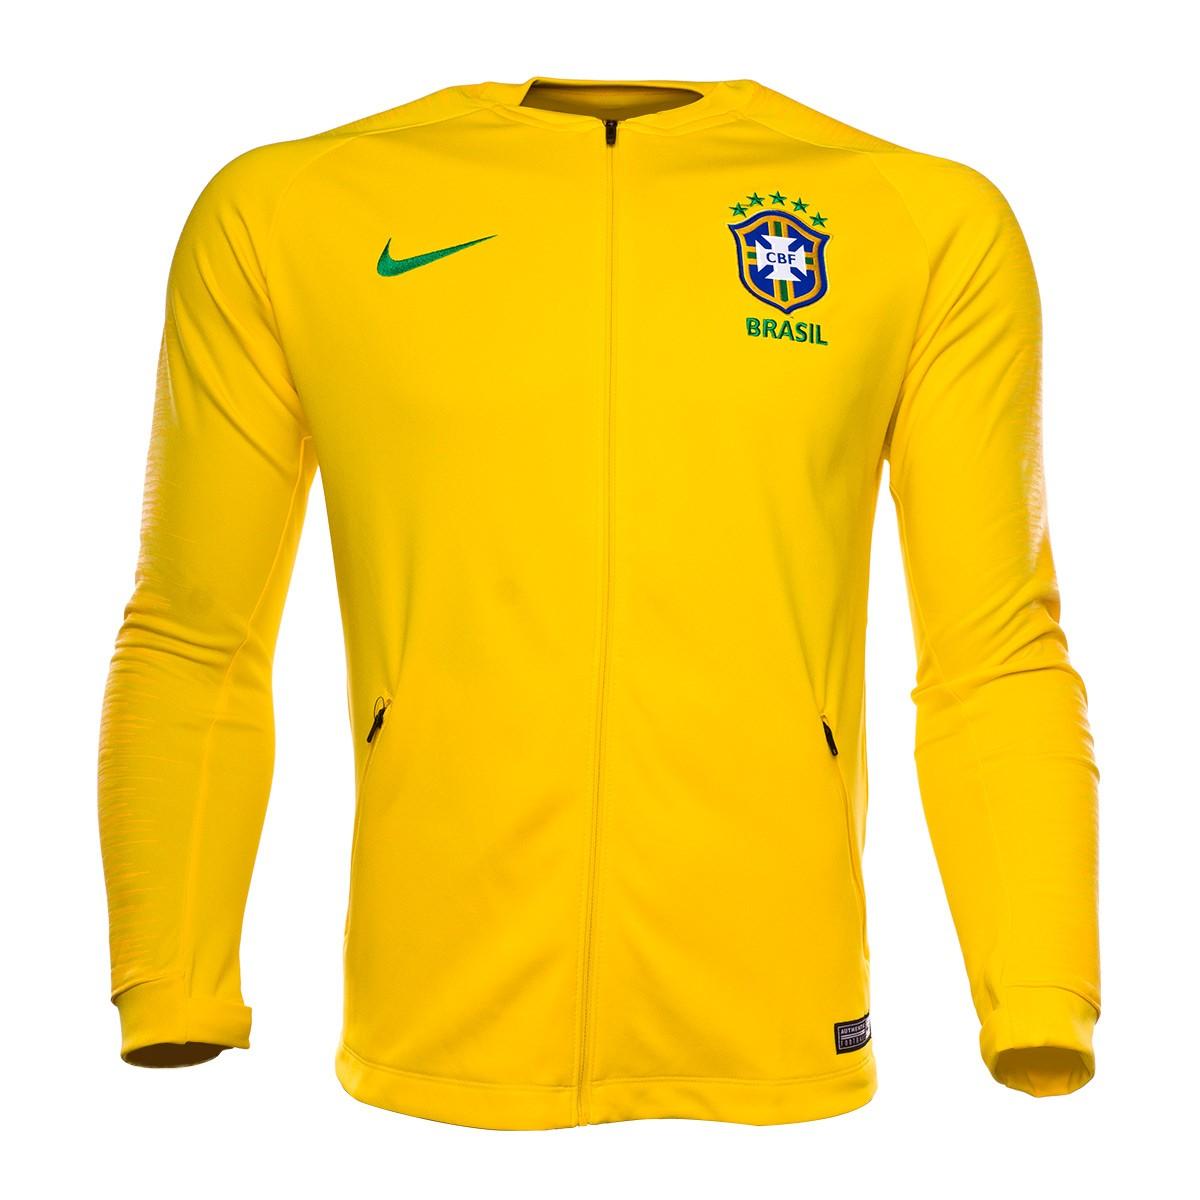 2419f56016be2 Chaqueta Nike Brasil Pre-Match 2018-2019 Midwest gold-Varsity maize-Lucky  green - Tienda de fútbol Fútbol Emotion